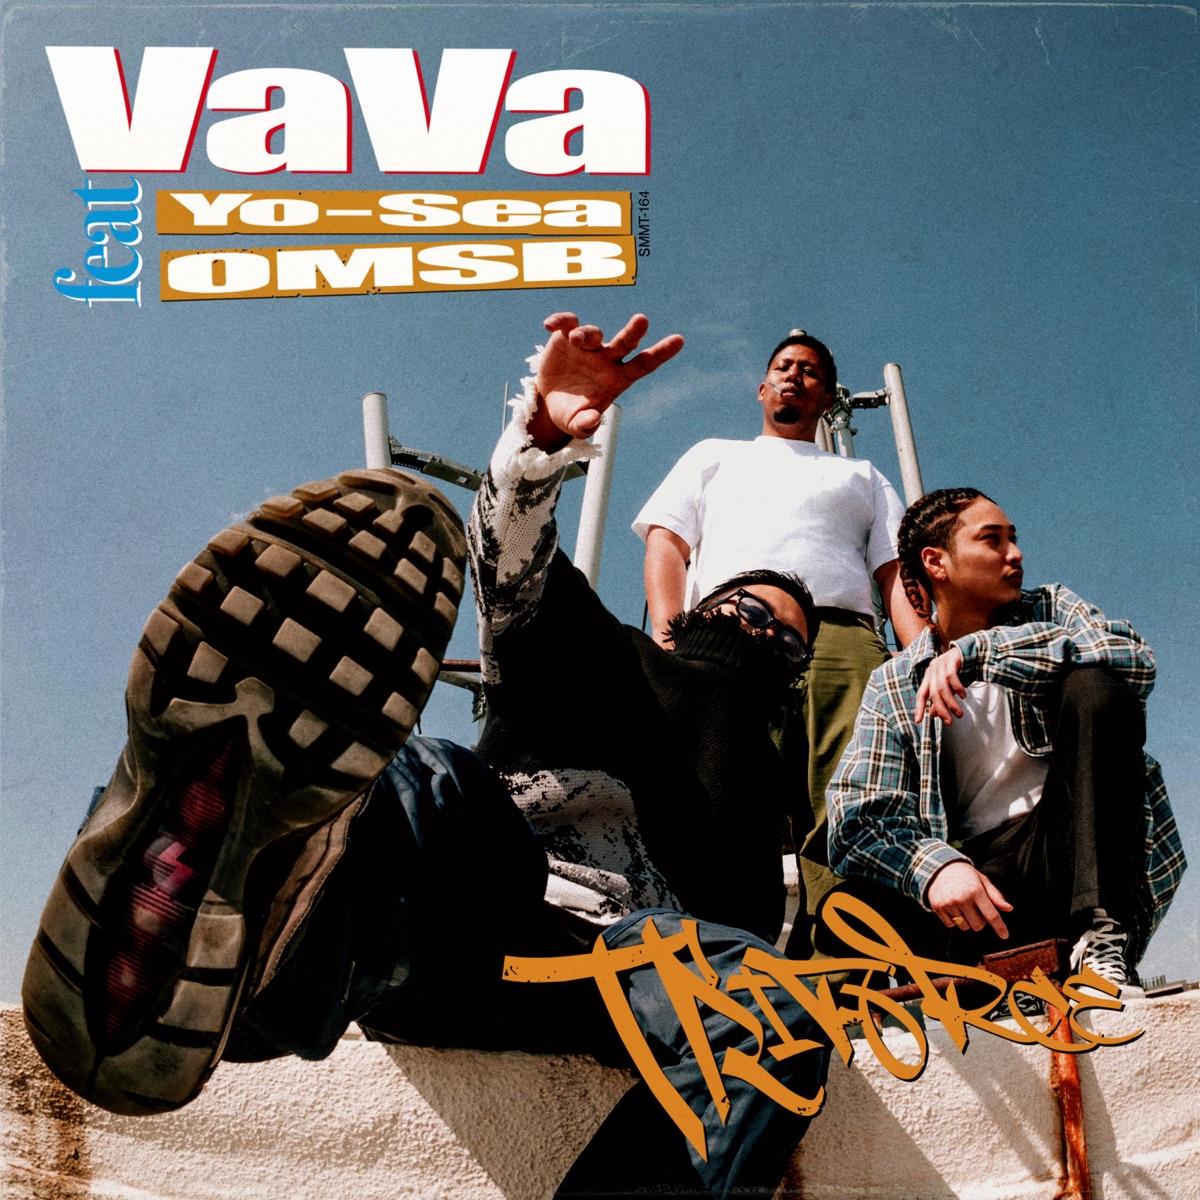 『VaVa - Triforce feat. Yo-Sea, OMSB』収録の『Triforce feat. Yo-Sea, OMSB』ジャケット